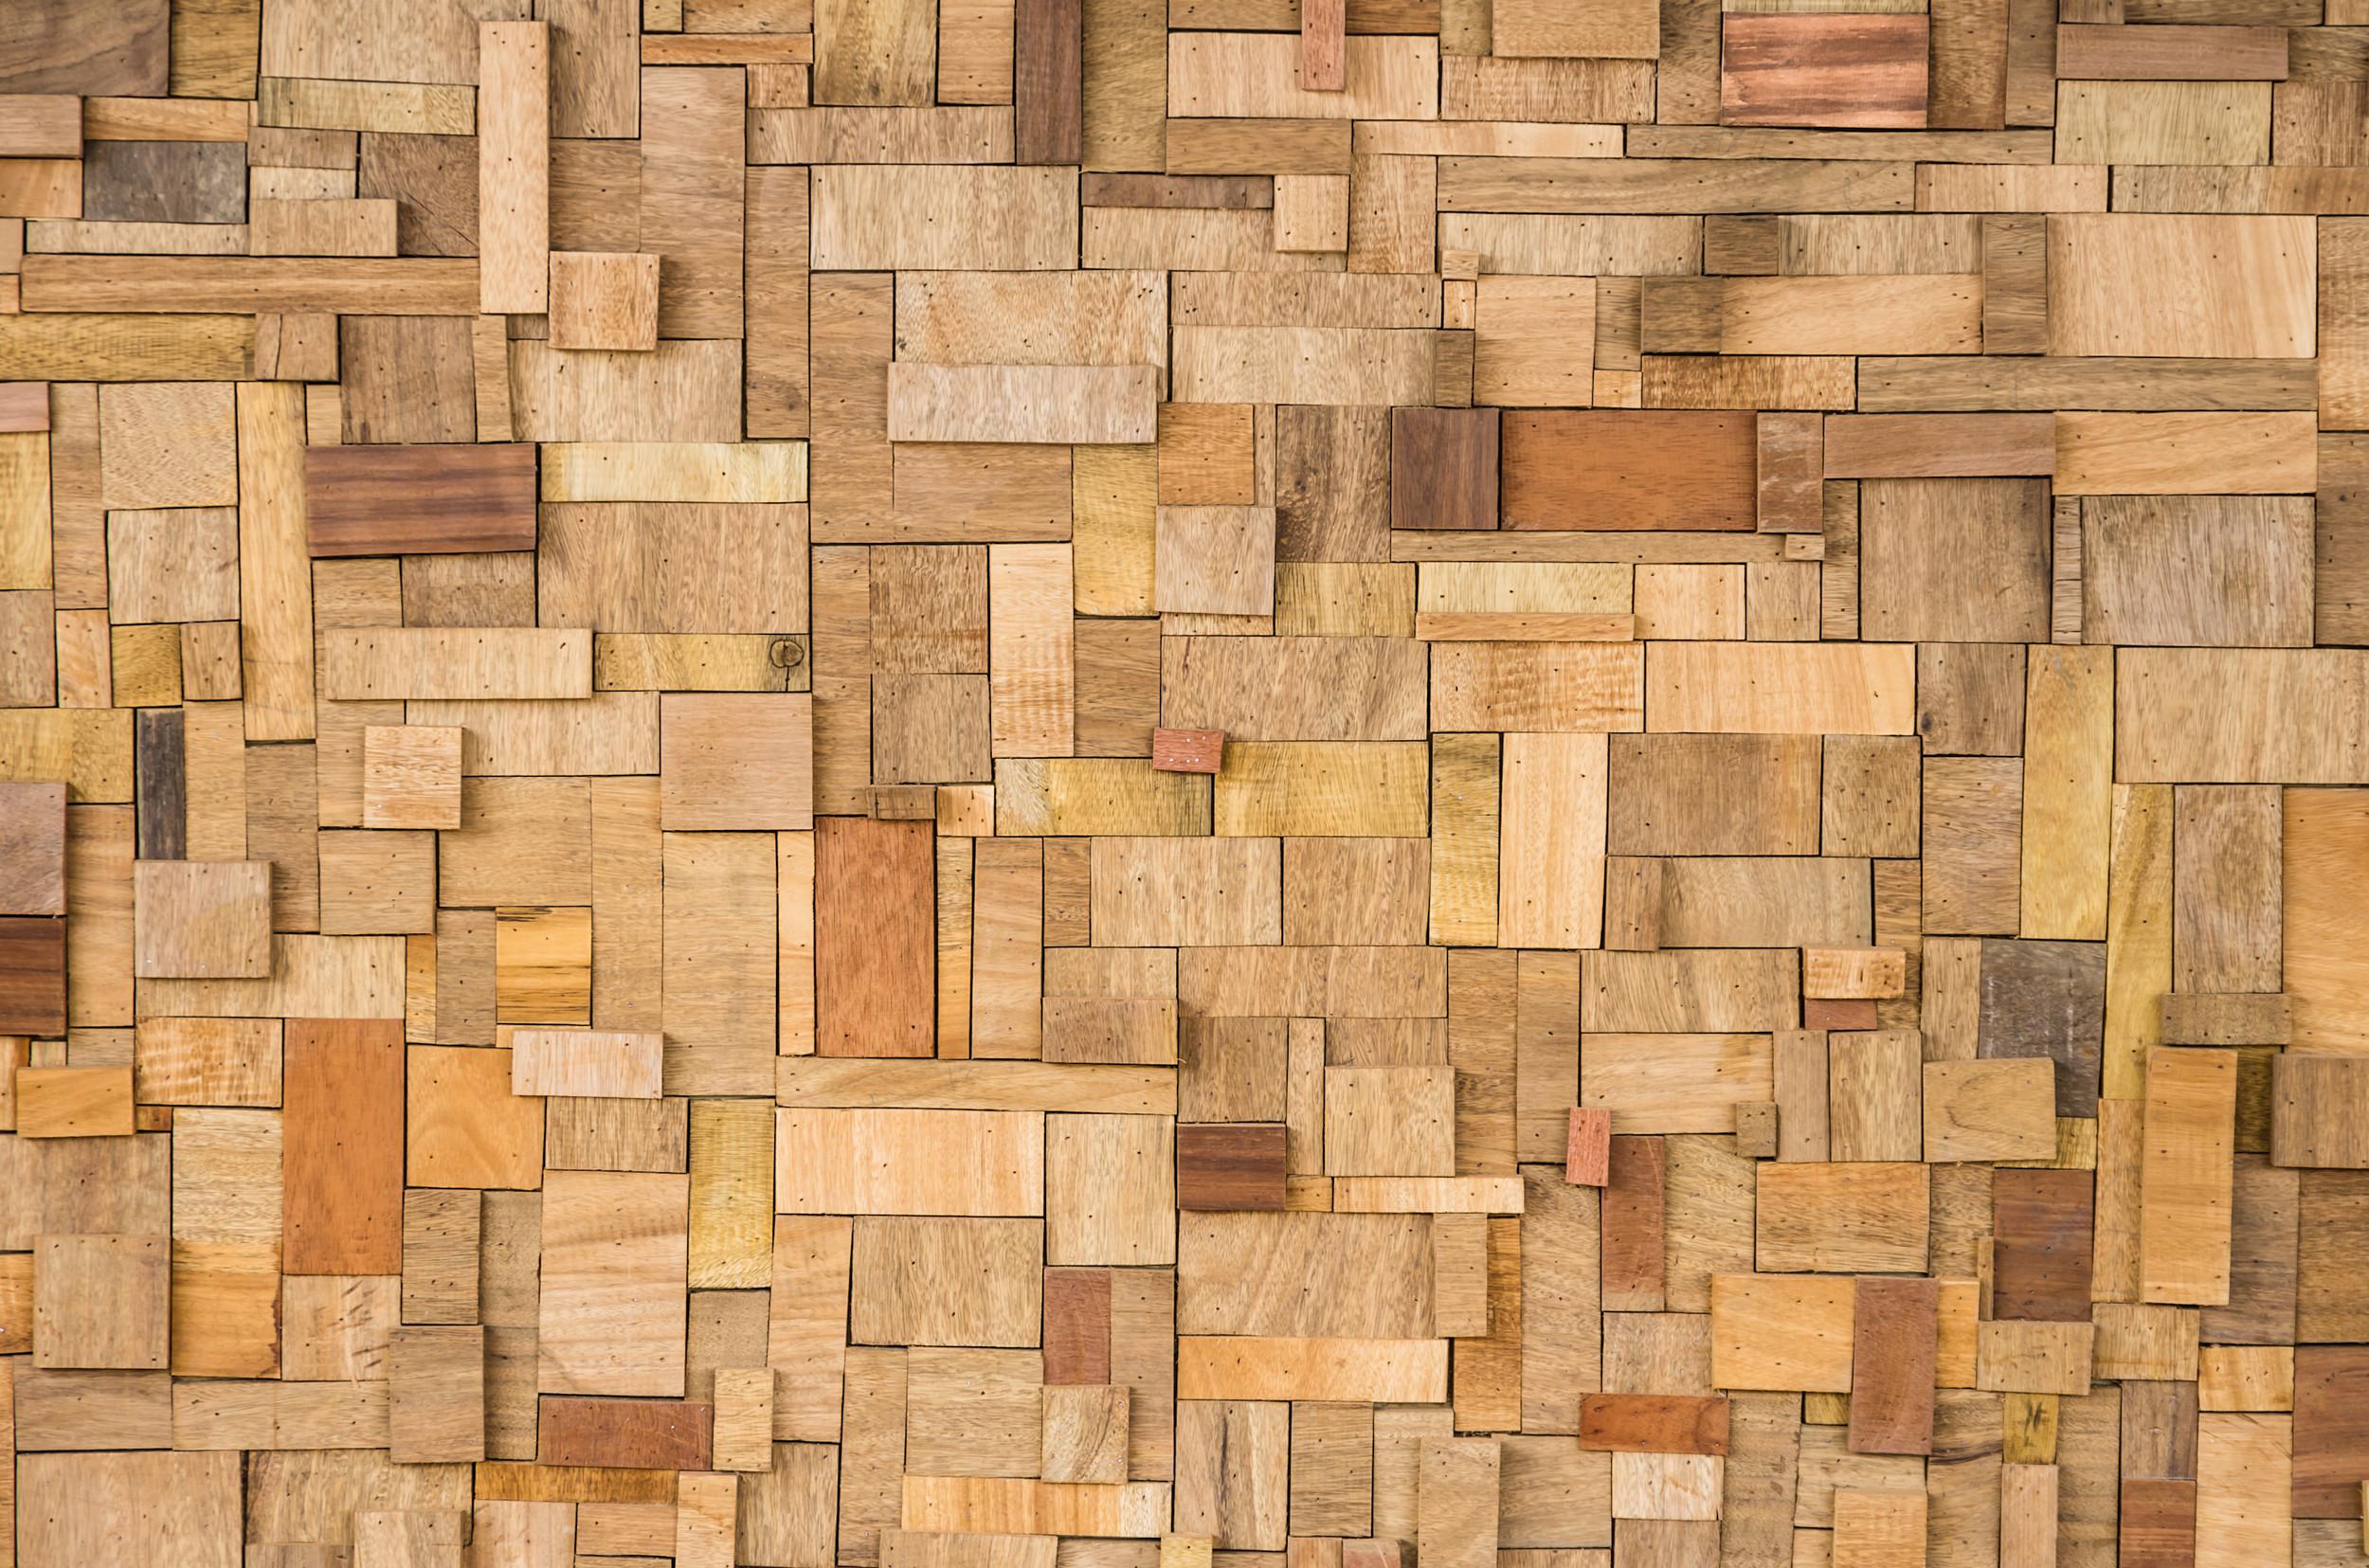 Hd wood background 2500x1655 wood wallpapers hd desktop download voltagebd Choice Image